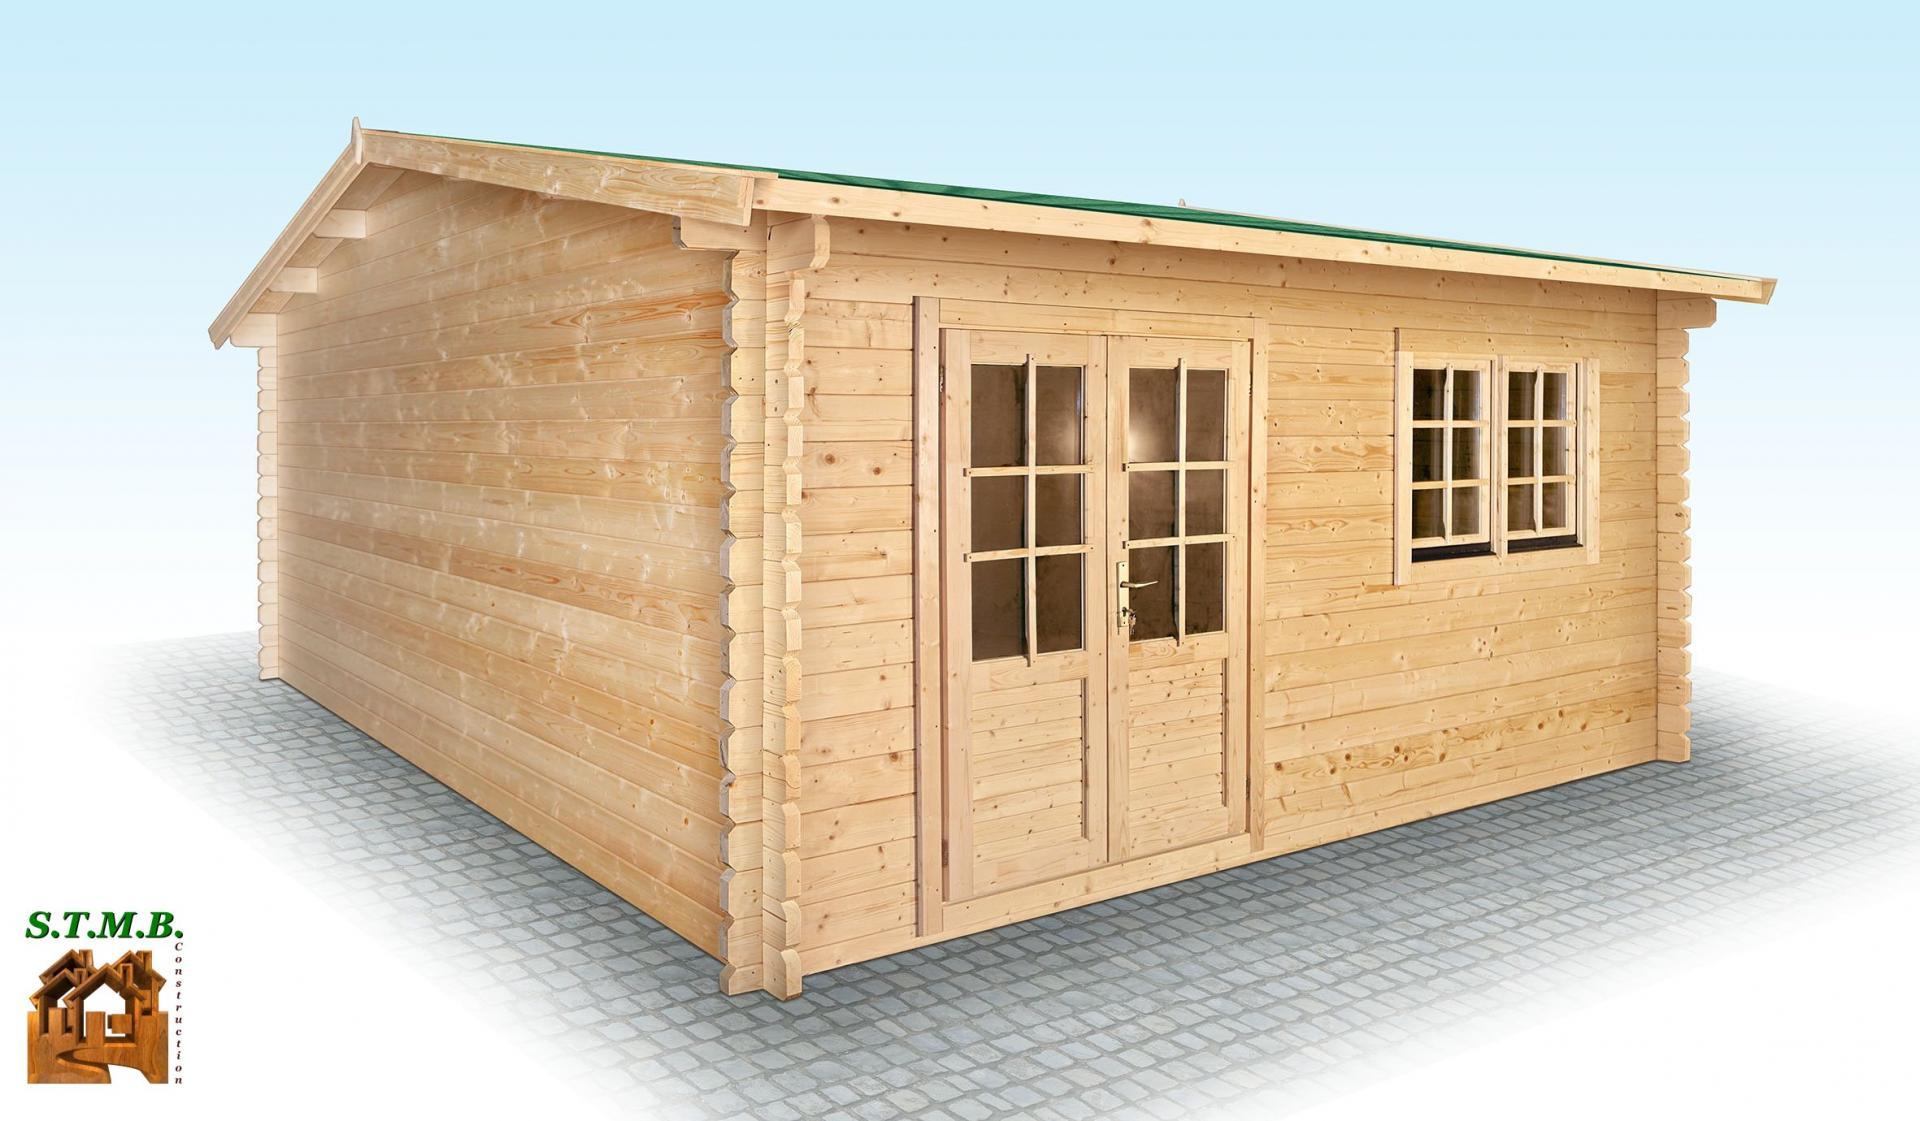 Construire sa maison en bois en kit tarif amazing maison for Maison en kit tarif